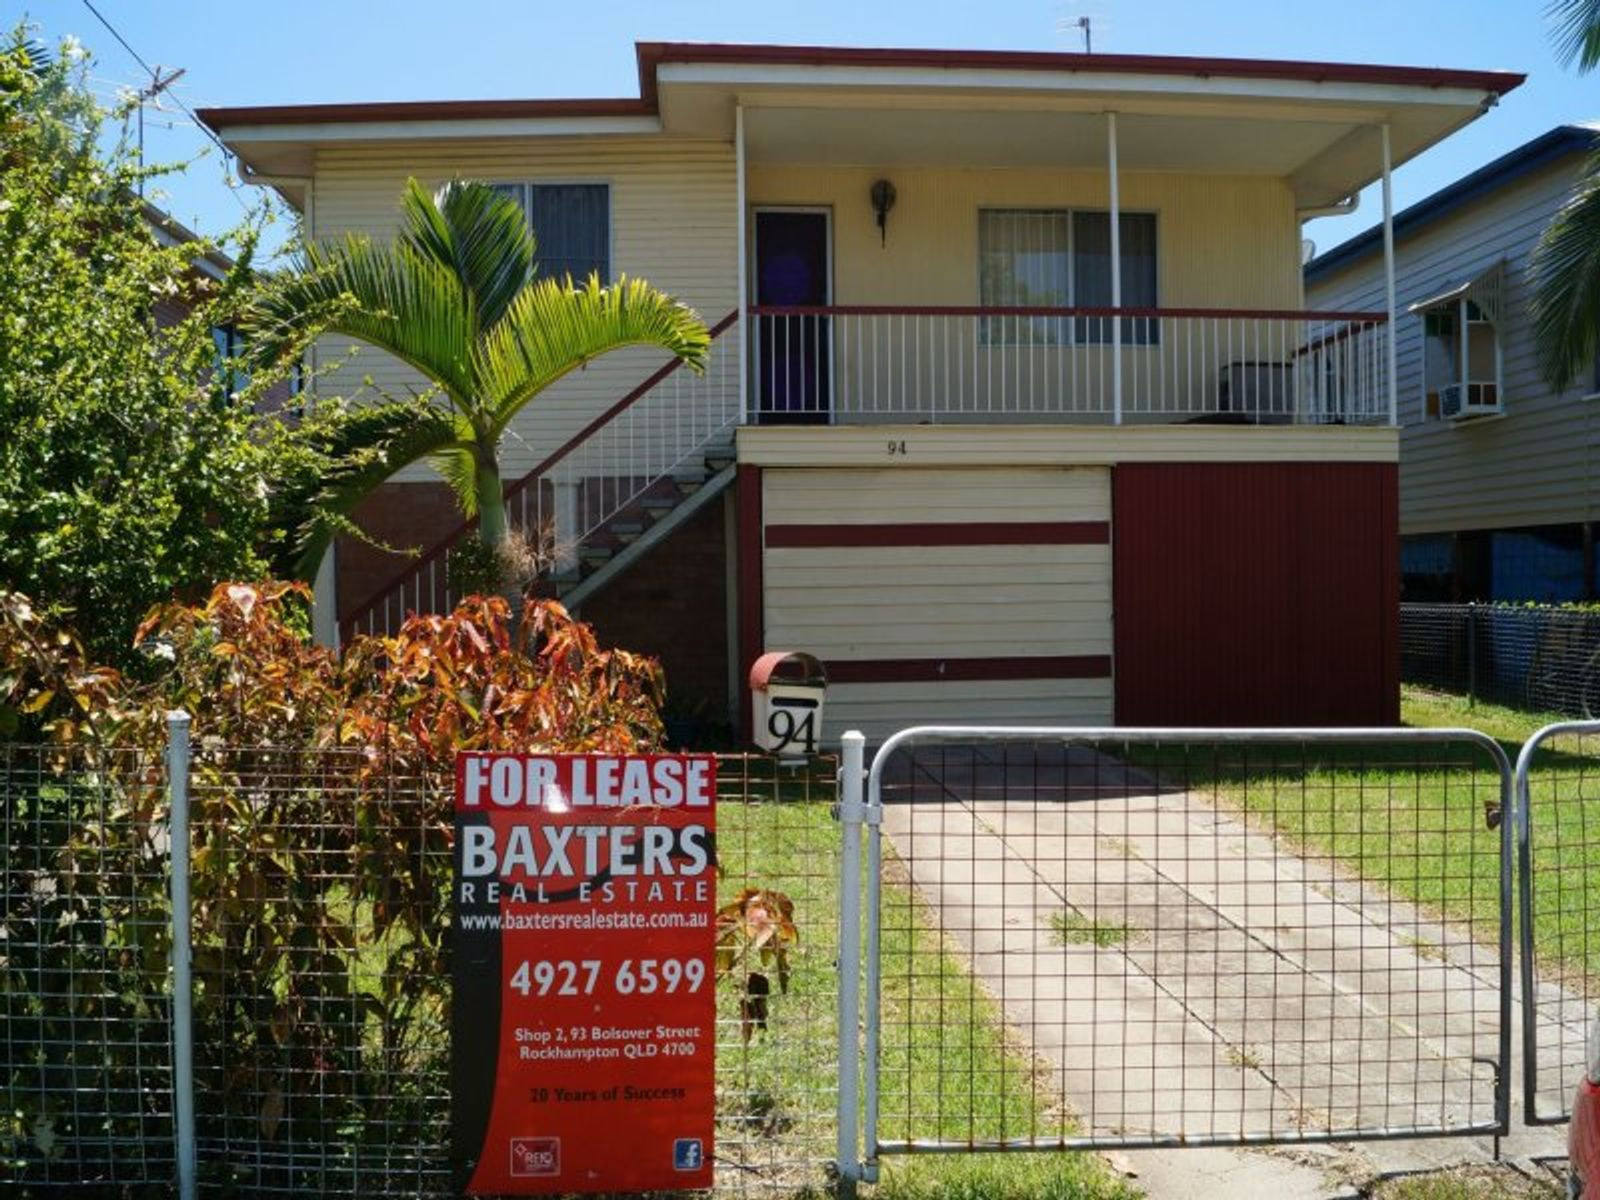 94 Glenmore Road, Park Avenue, QLD 4701